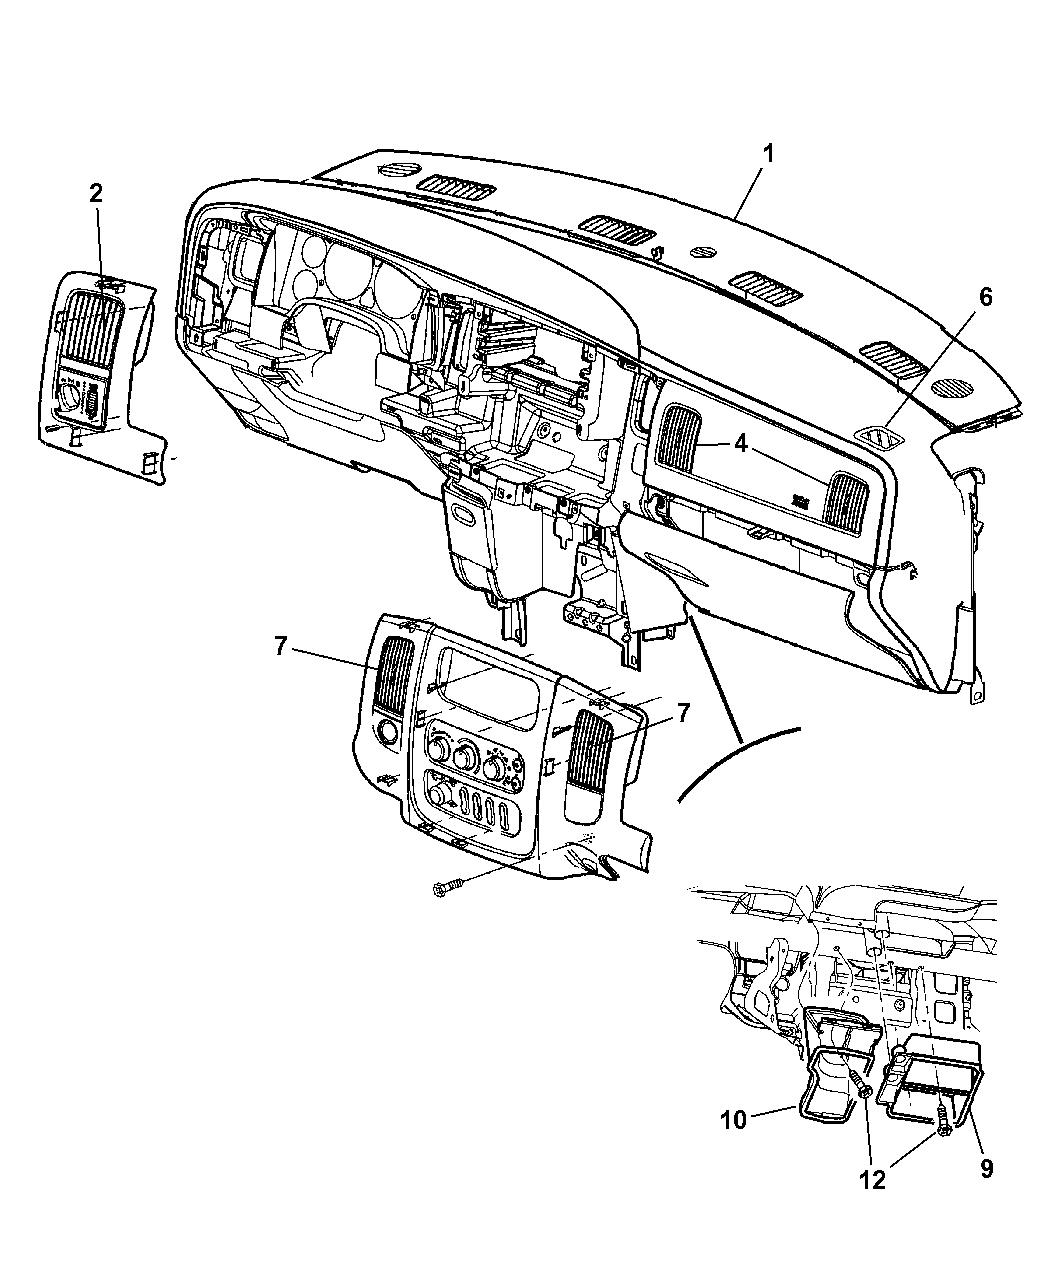 2003 dodge ram 1500 air ducts - mopar parts giant 97 dodge ram 1500 wiring diagram #14